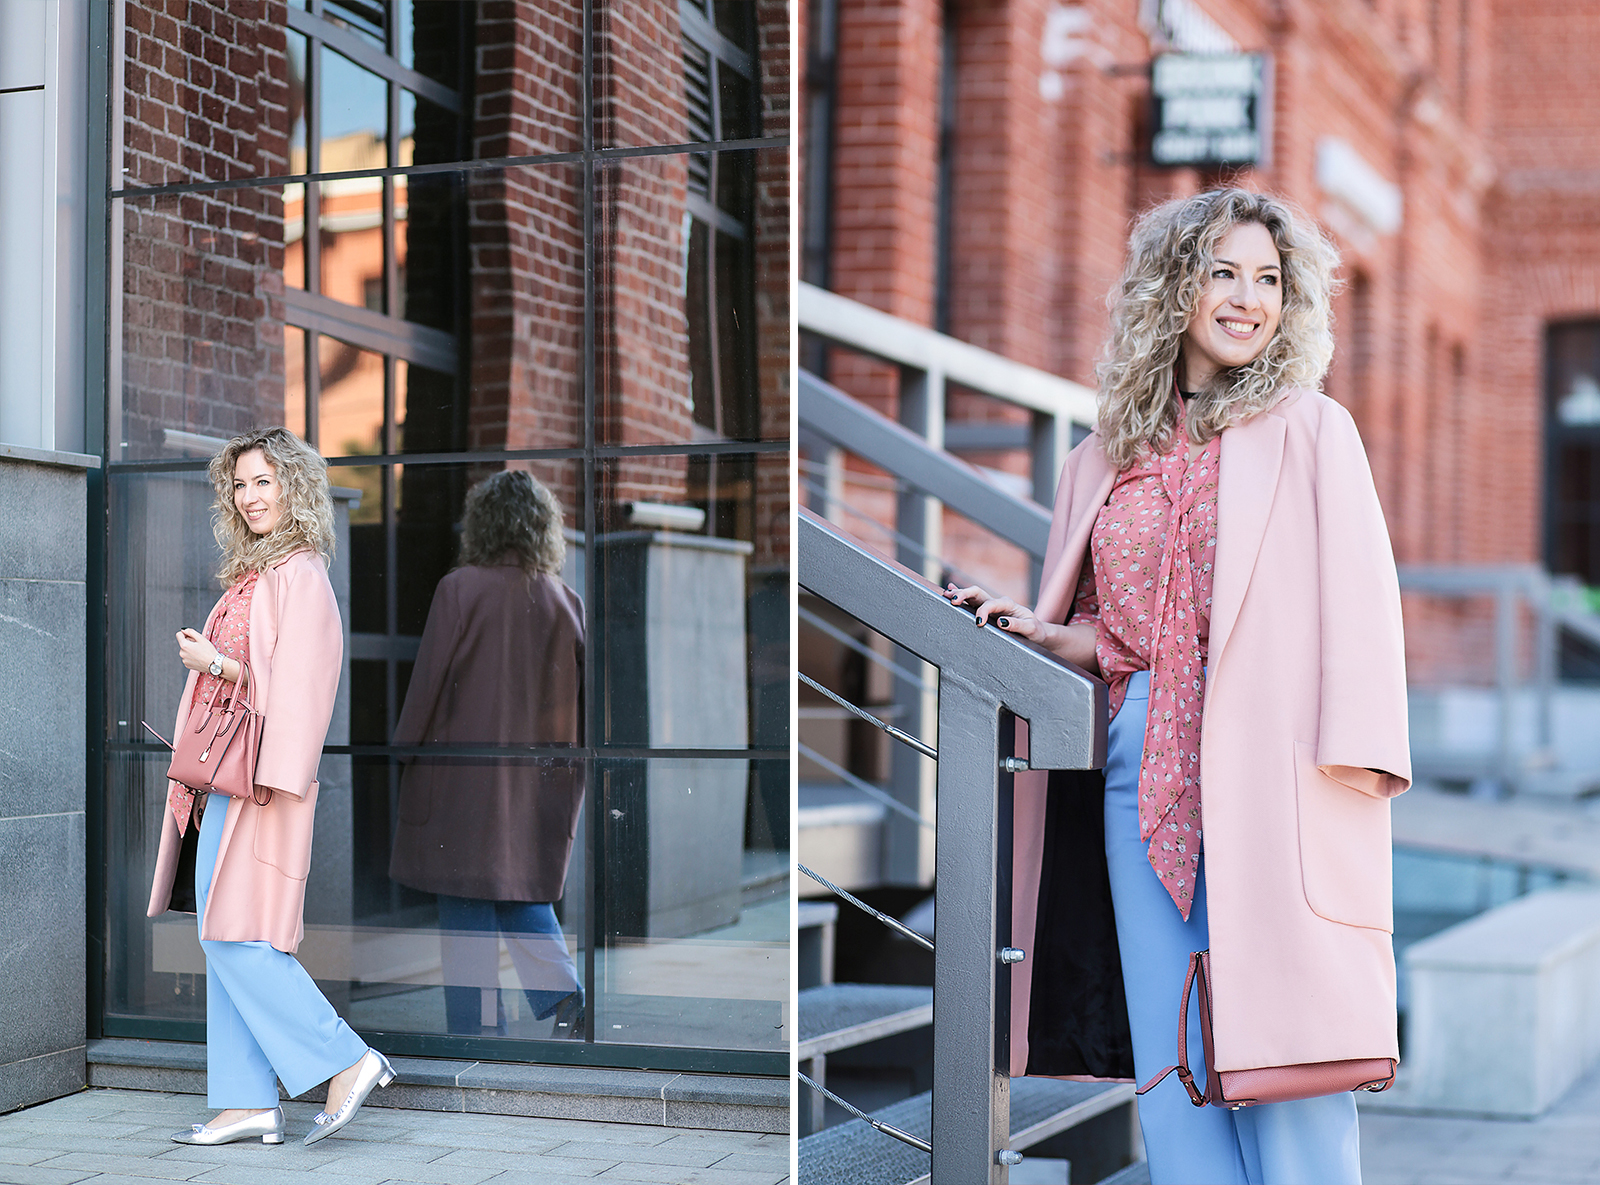 Rita_maslova_ritalifestyle_moscow_fashion_blogger_blue_pants_pink_coat_silver_shoes